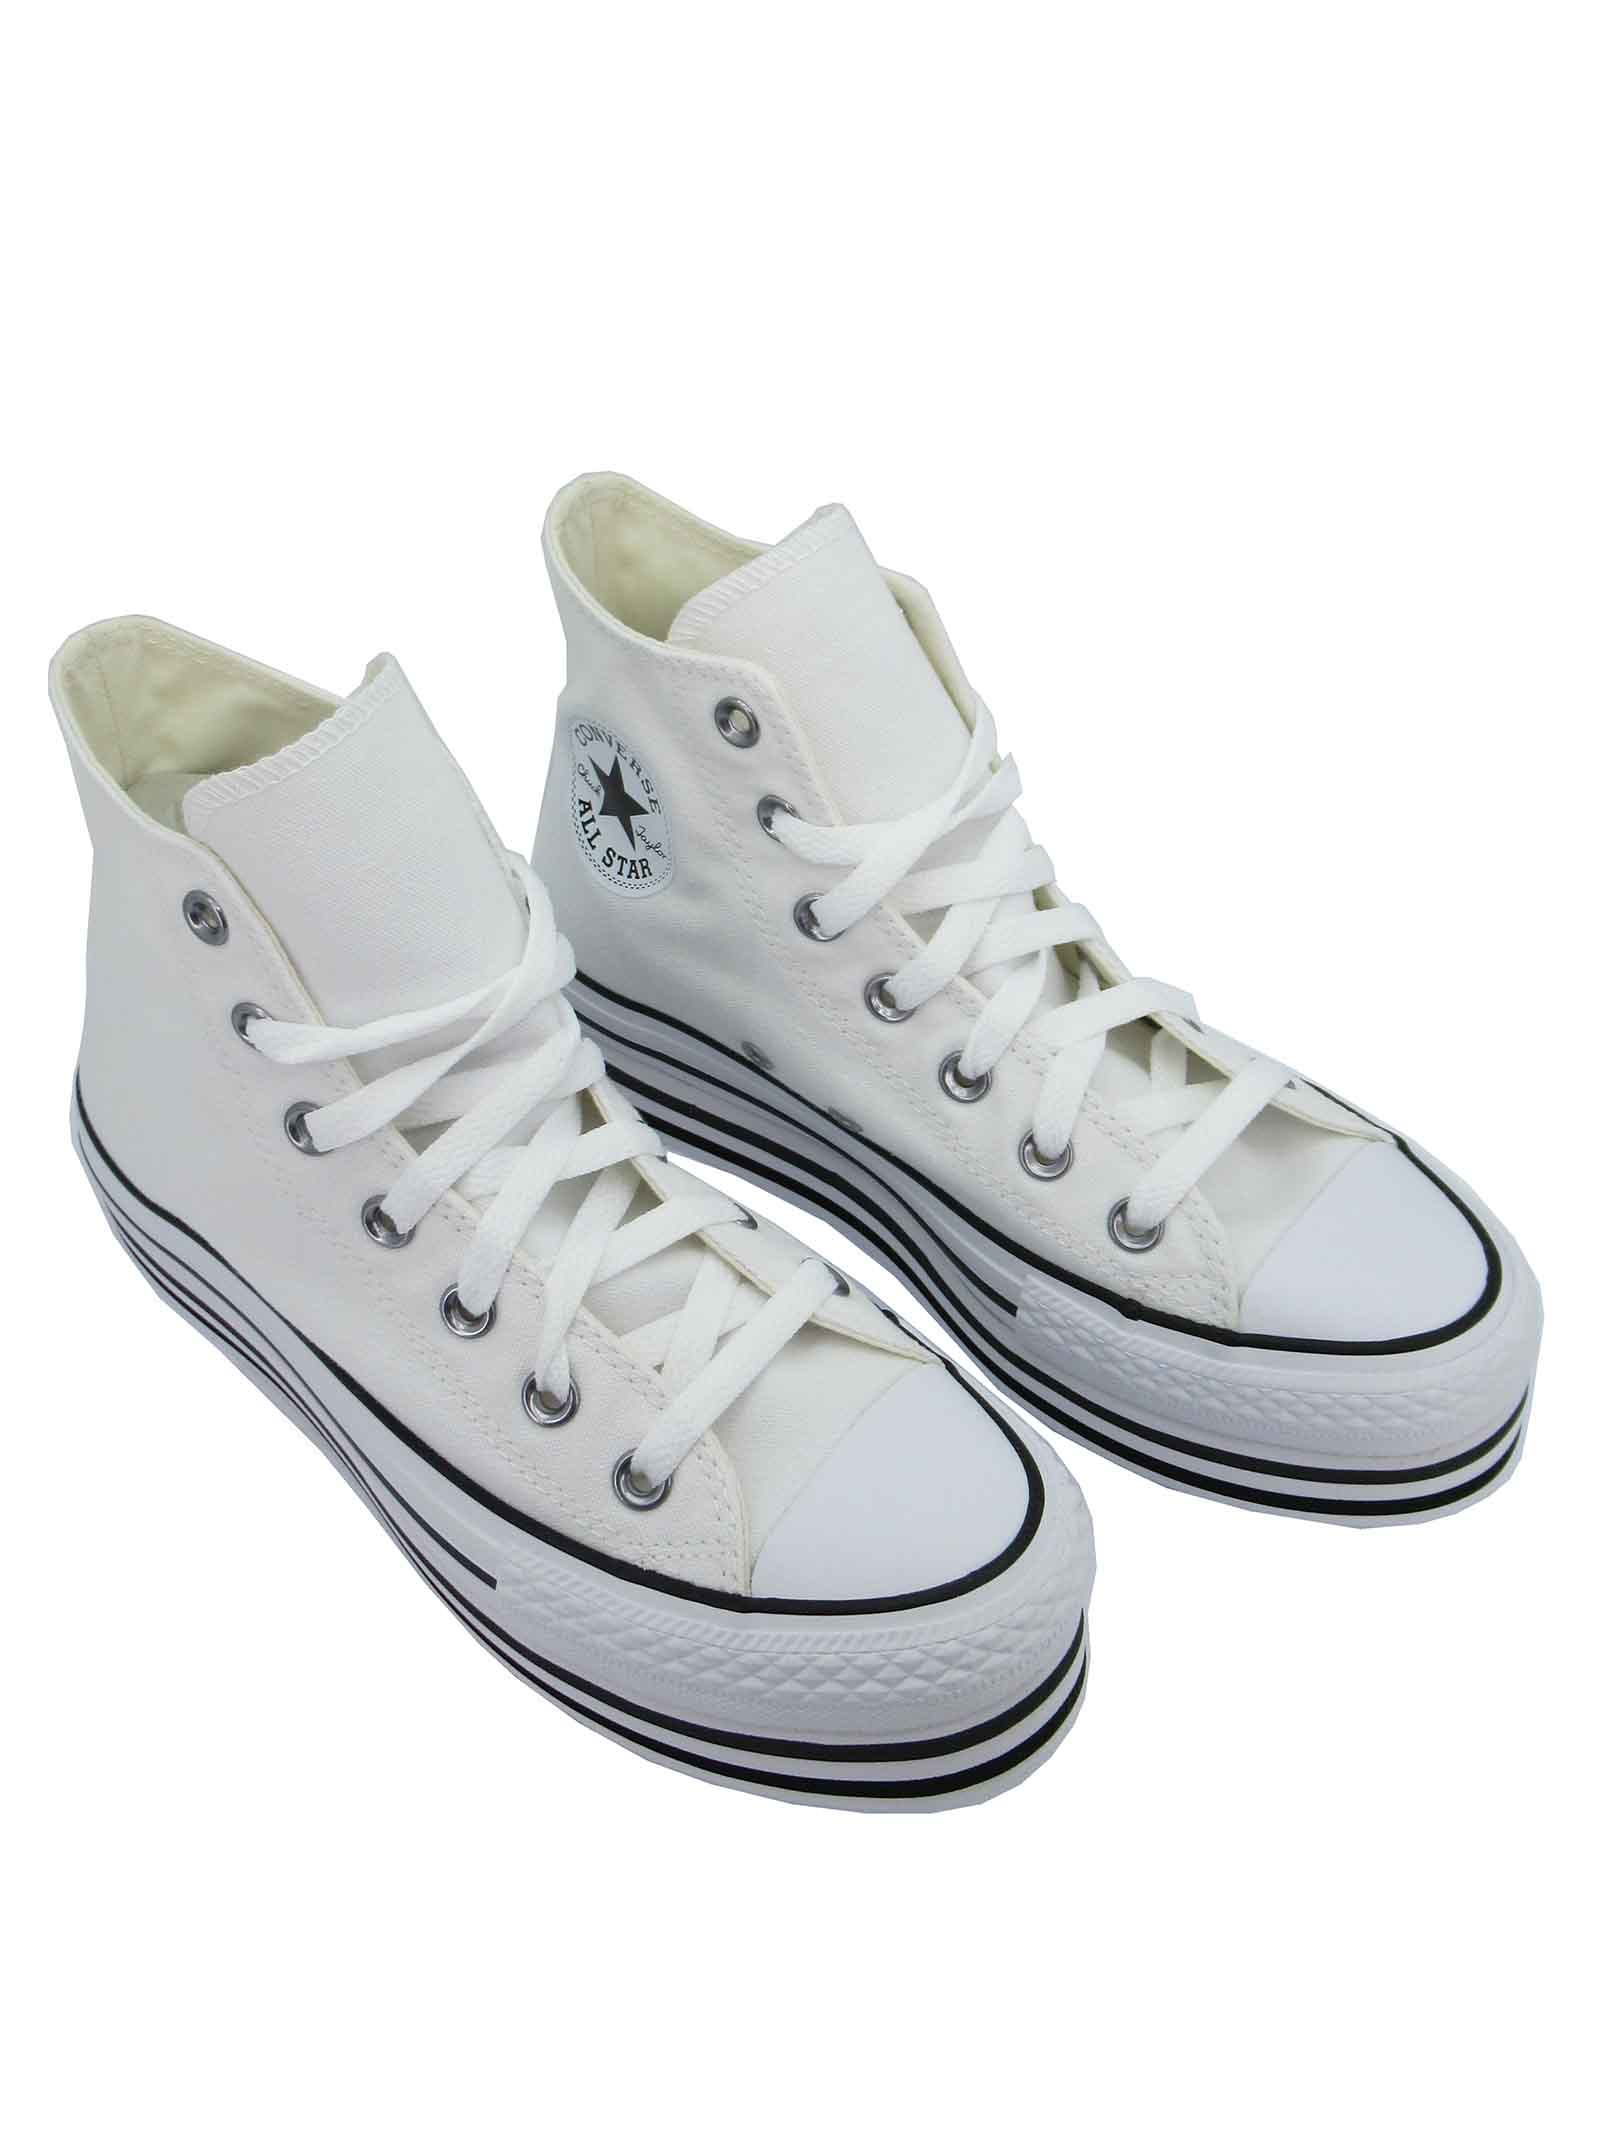 Calzature Donna Sneakers Stivaletto Chuck Taylor Hight Top in Canvas Bianco e Fondo Zeppa Converse   Sneakers   CHUCK TAYLOR564485C